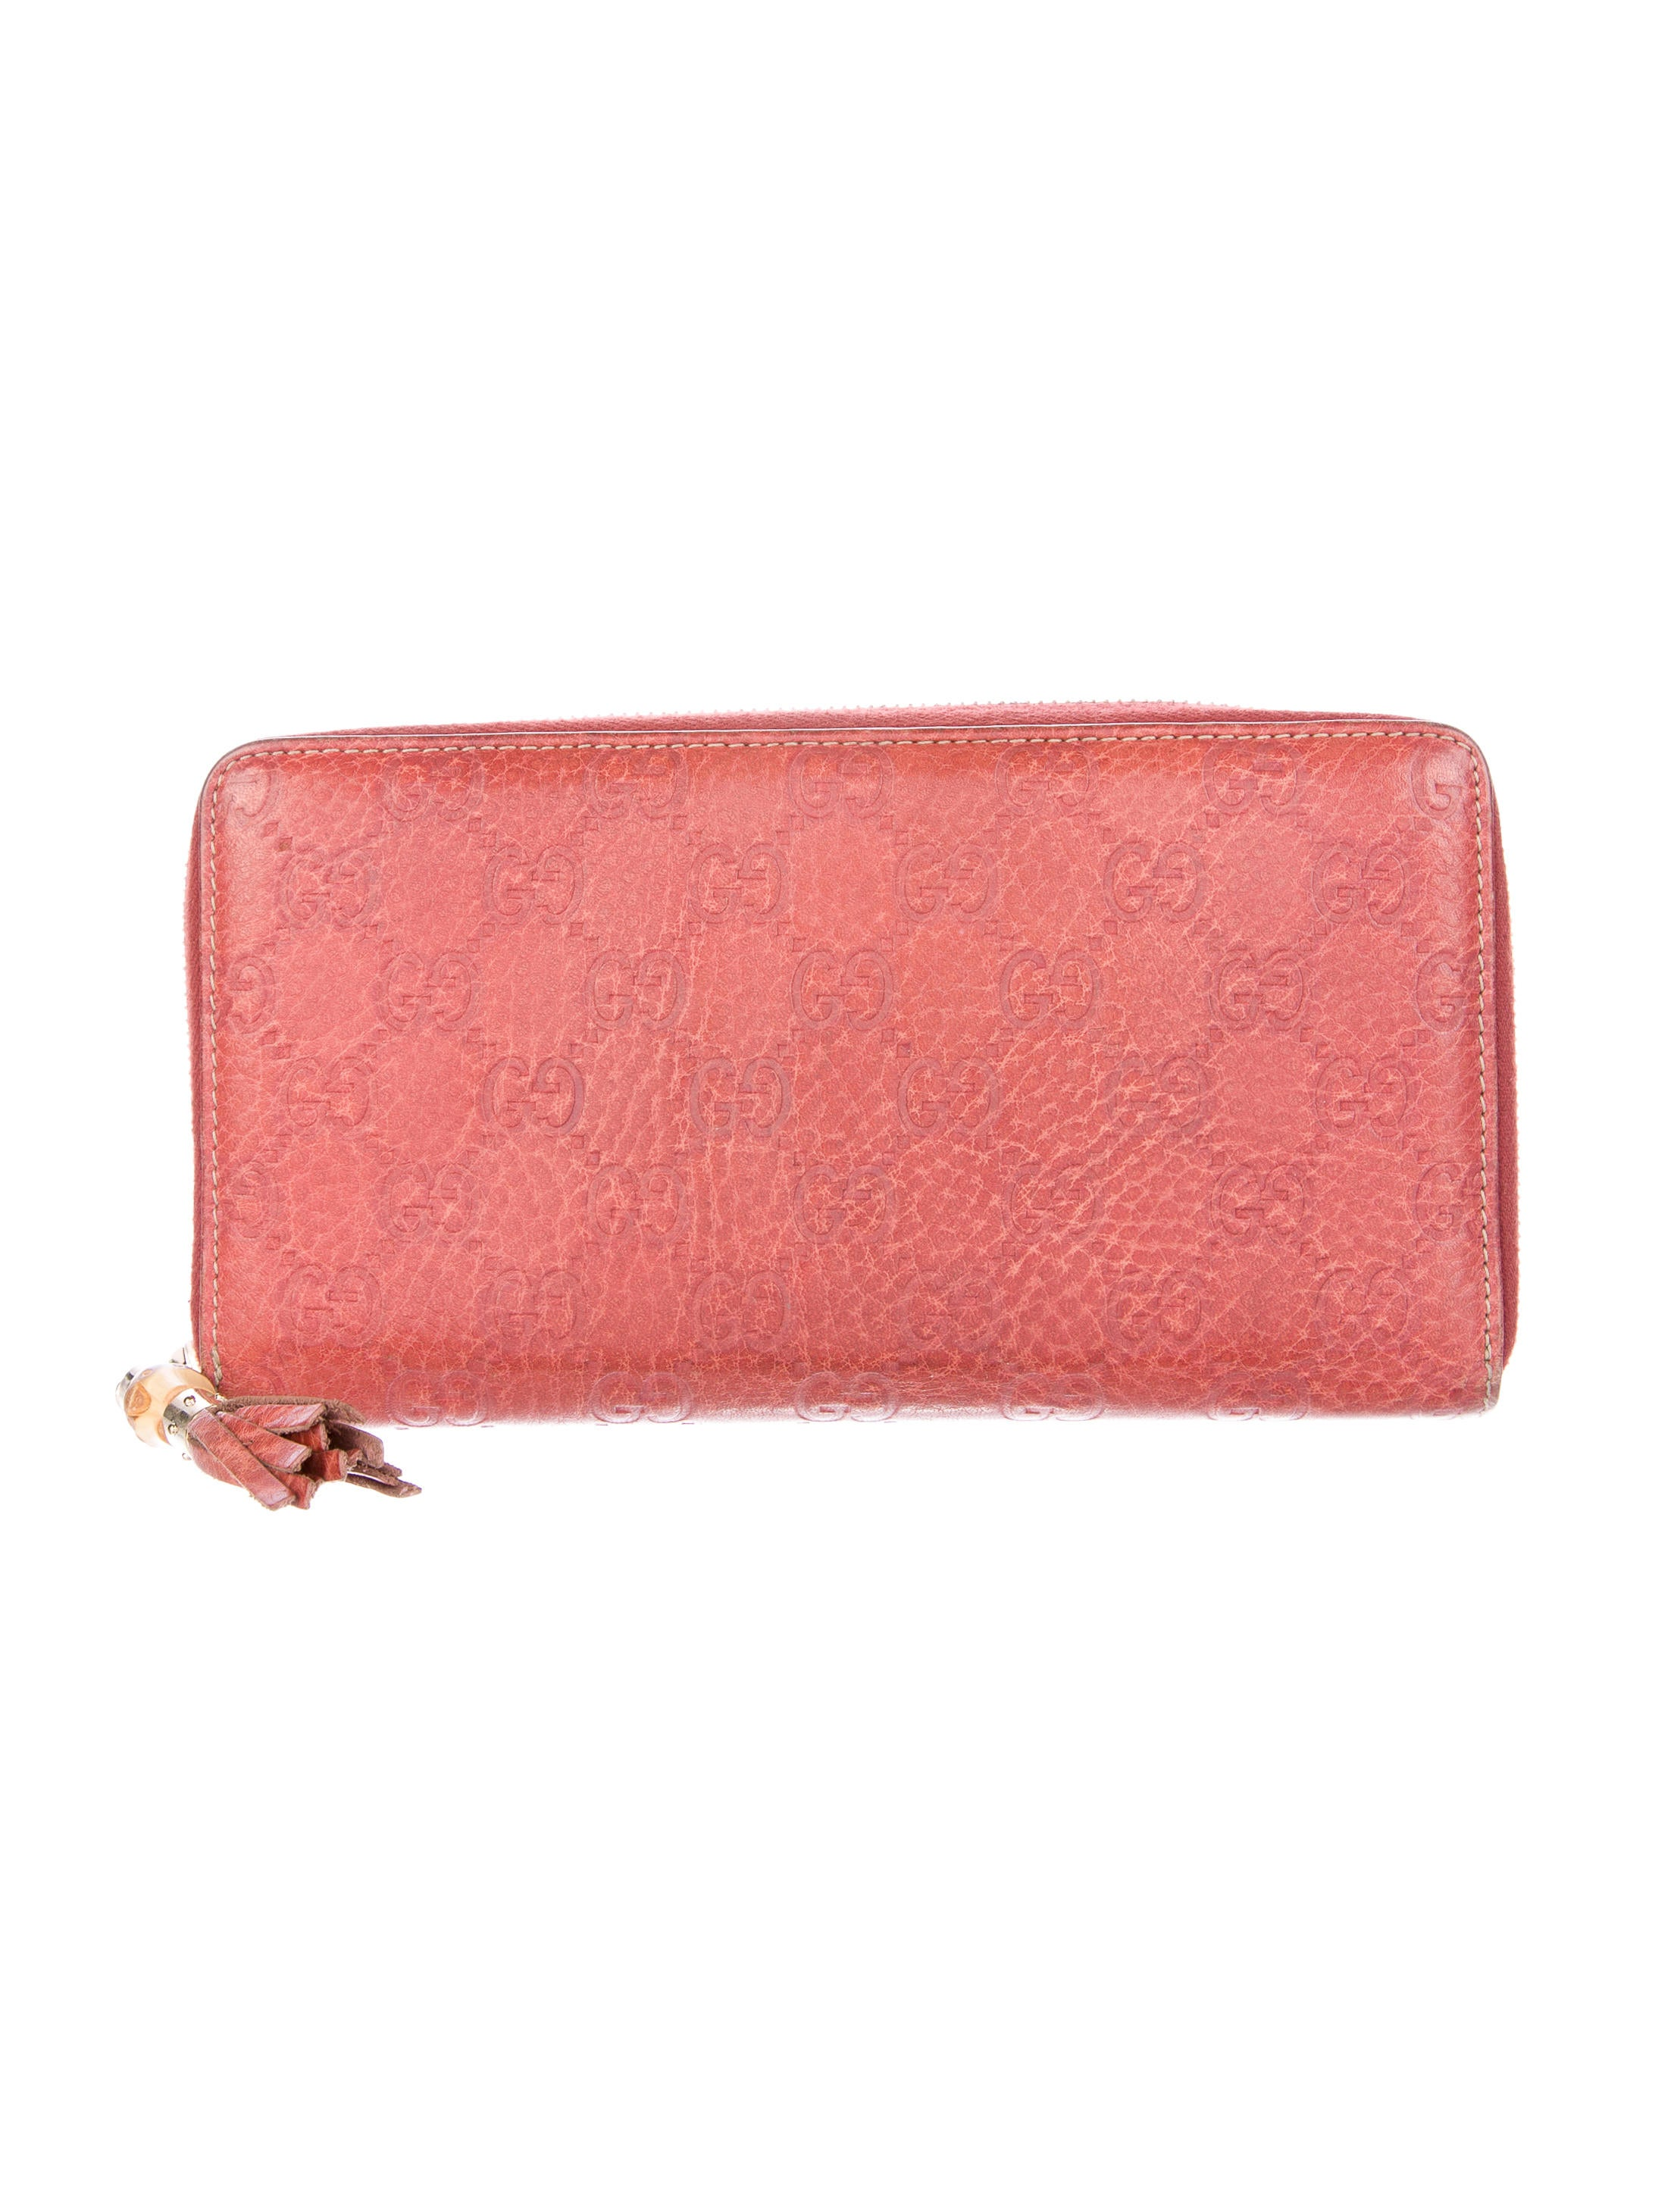 a73509e4192d Gucci Bamboo Tassel Zip-Around Wallet - Accessories - GUC127702 ...